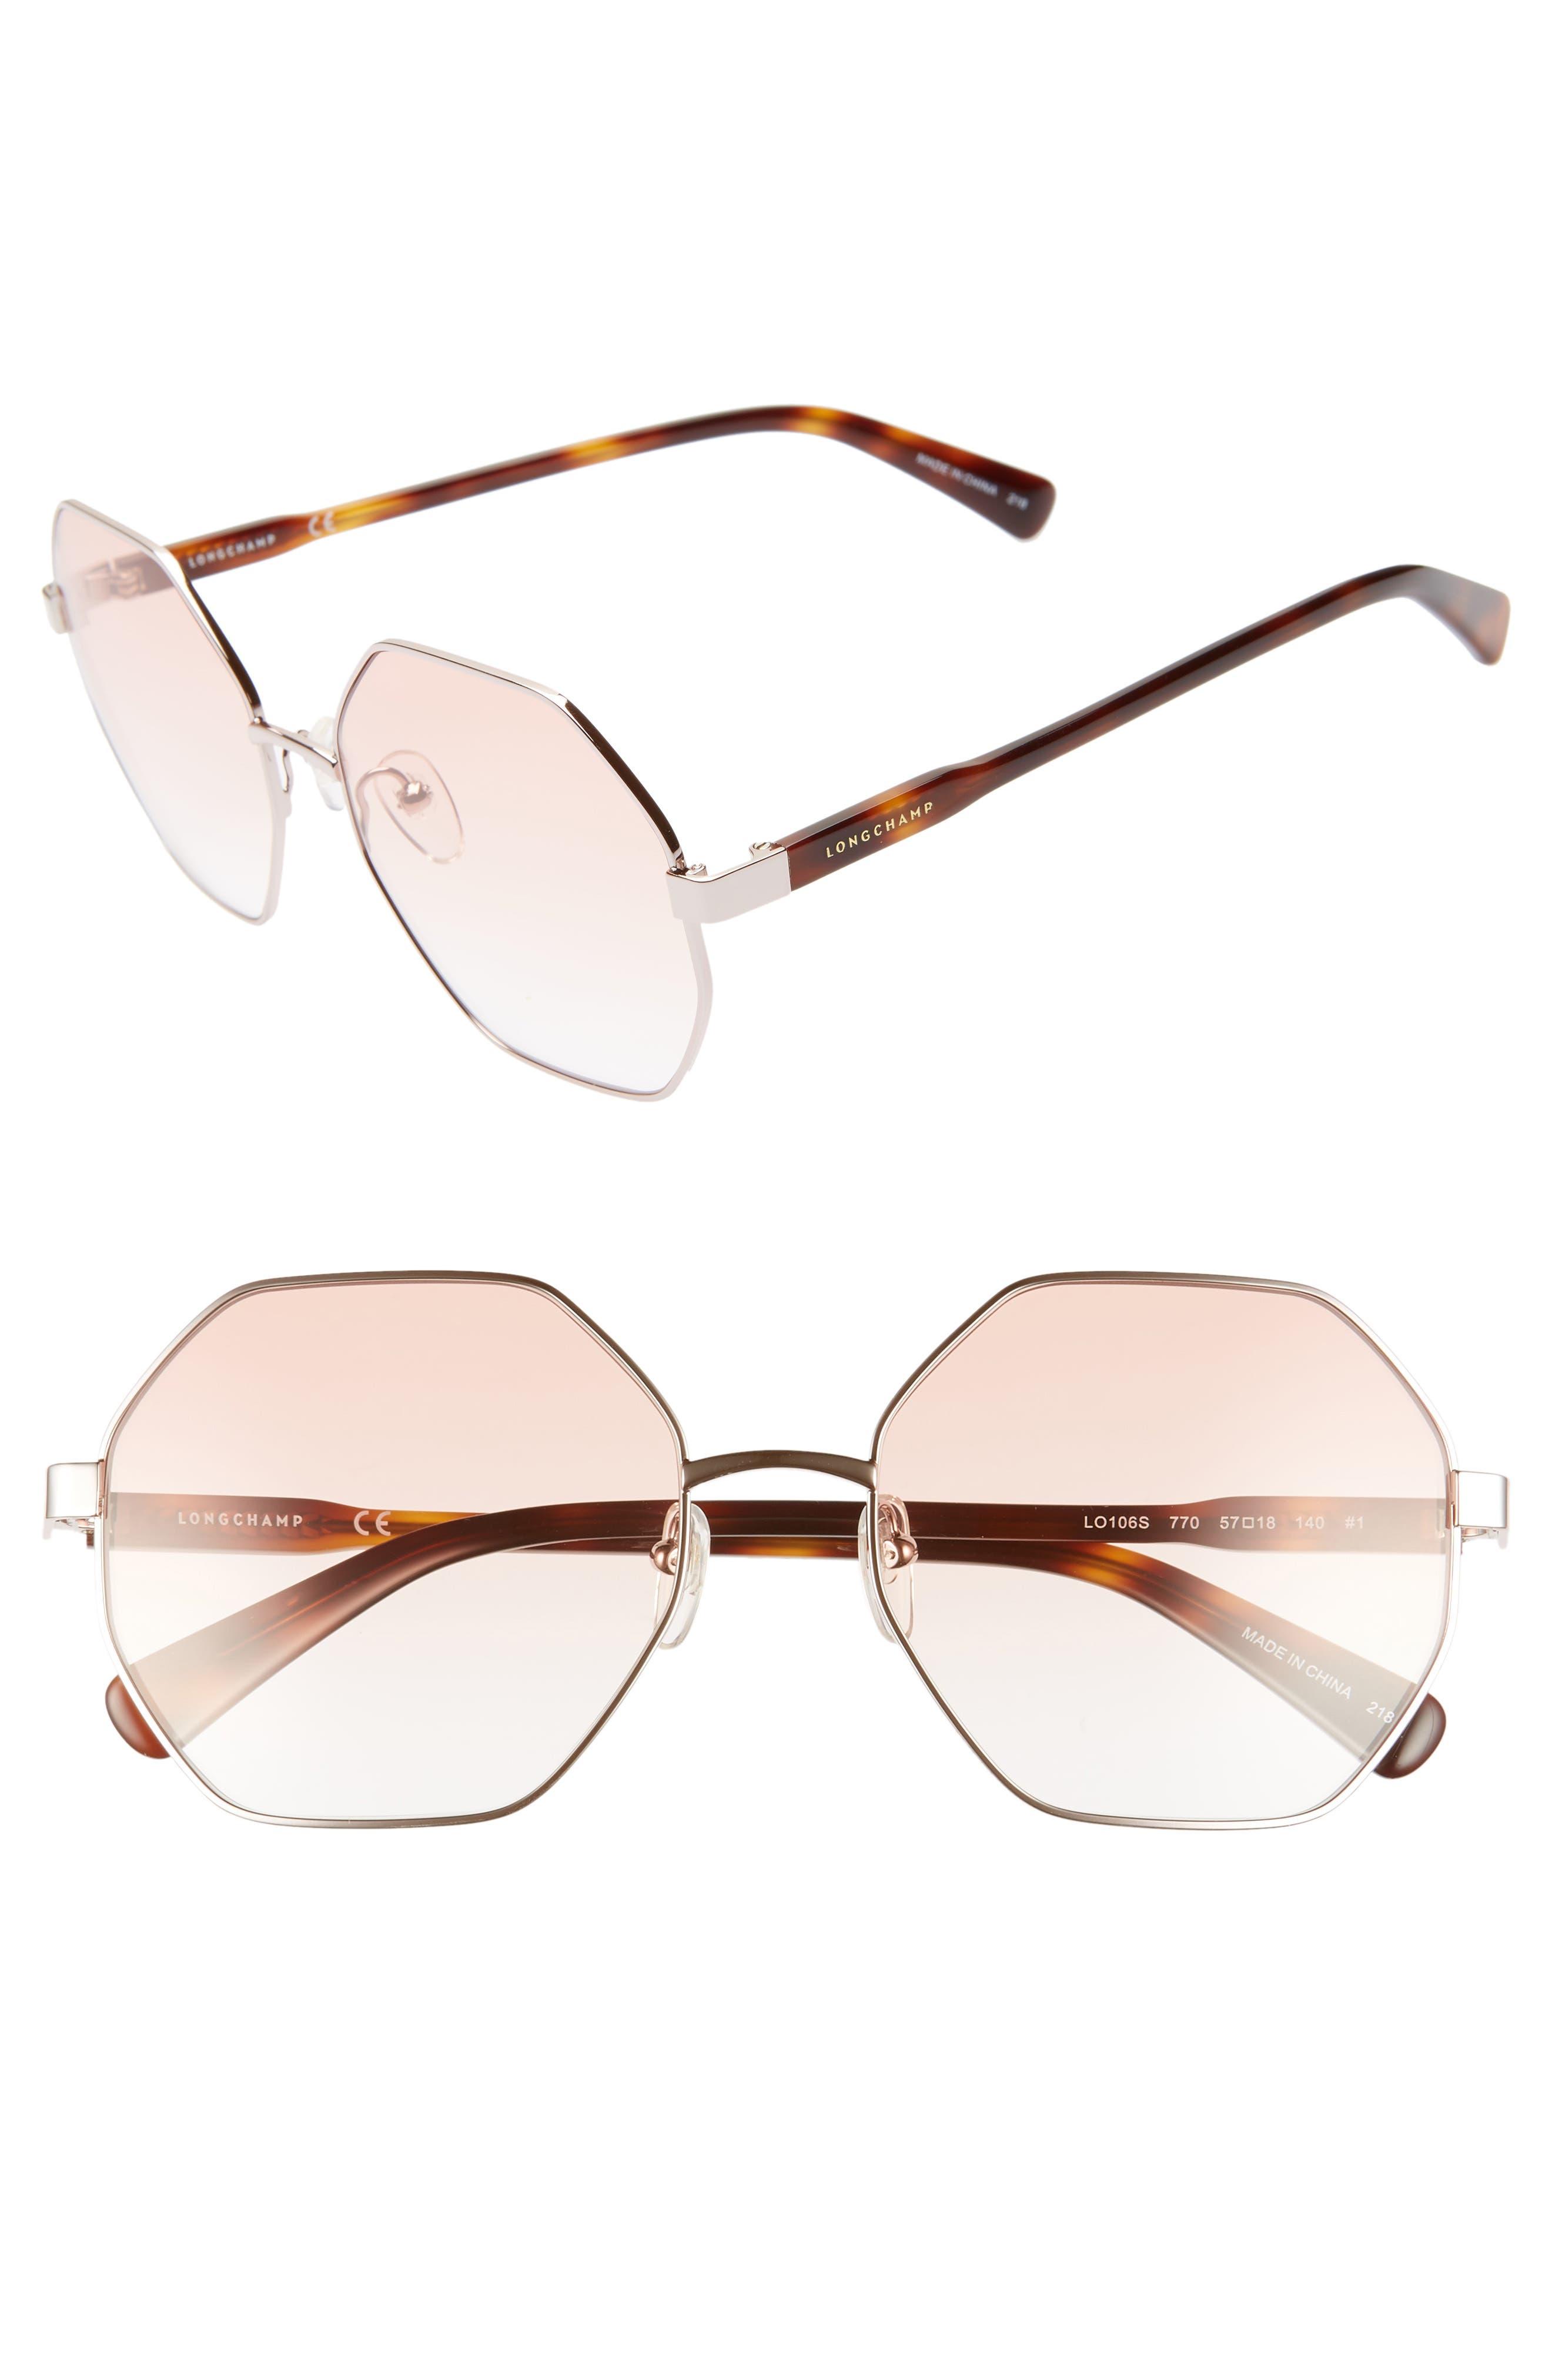 77dc7552c7b49 Longchamp Sunglasses for Women